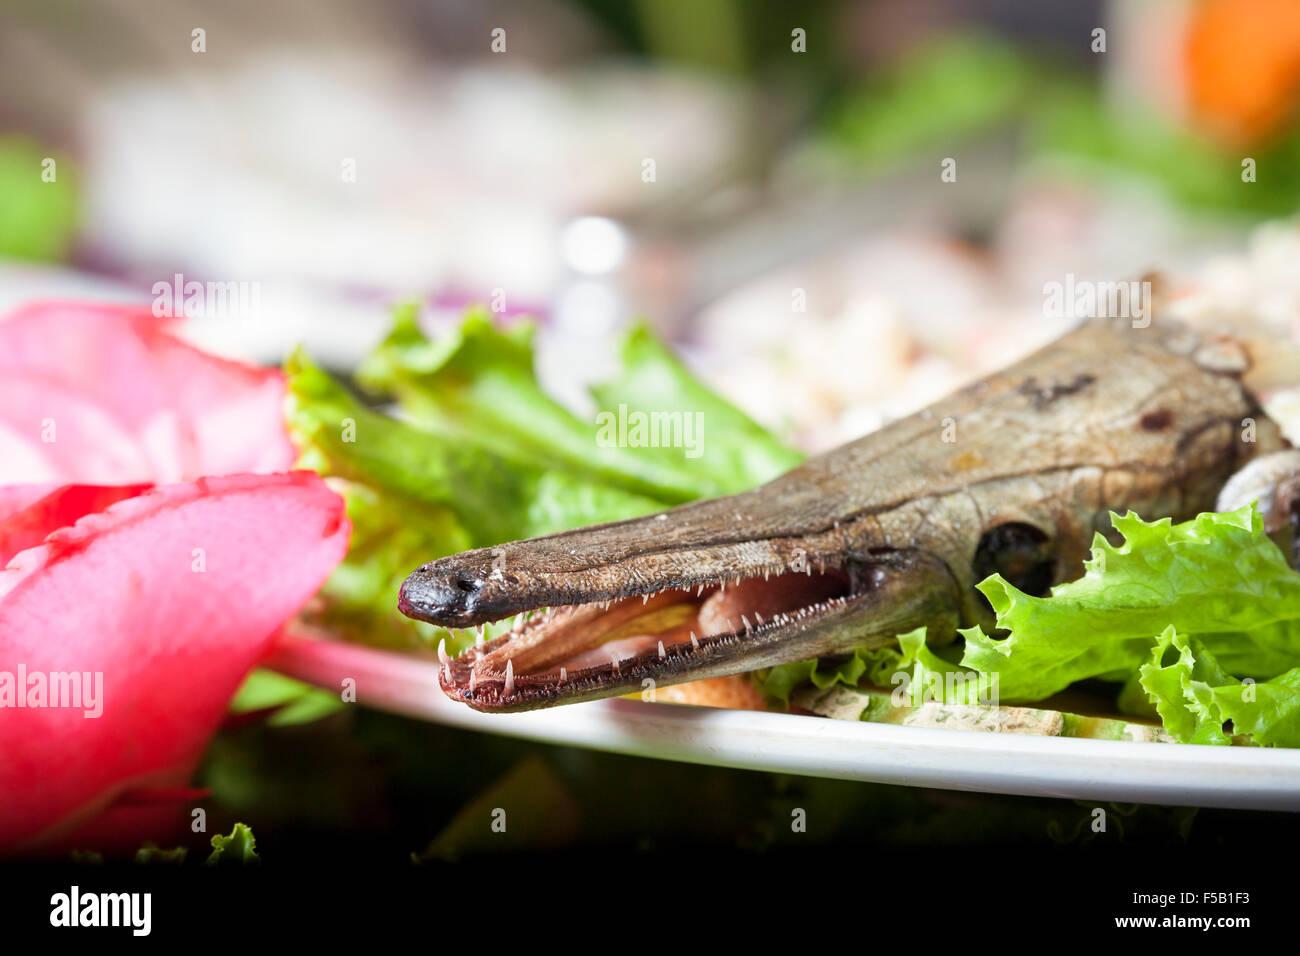 A local specialty, pejelagarto or freshwater gar, in a Villahermosa, Tabasco, Mexico seafood restaurant. - Stock Image